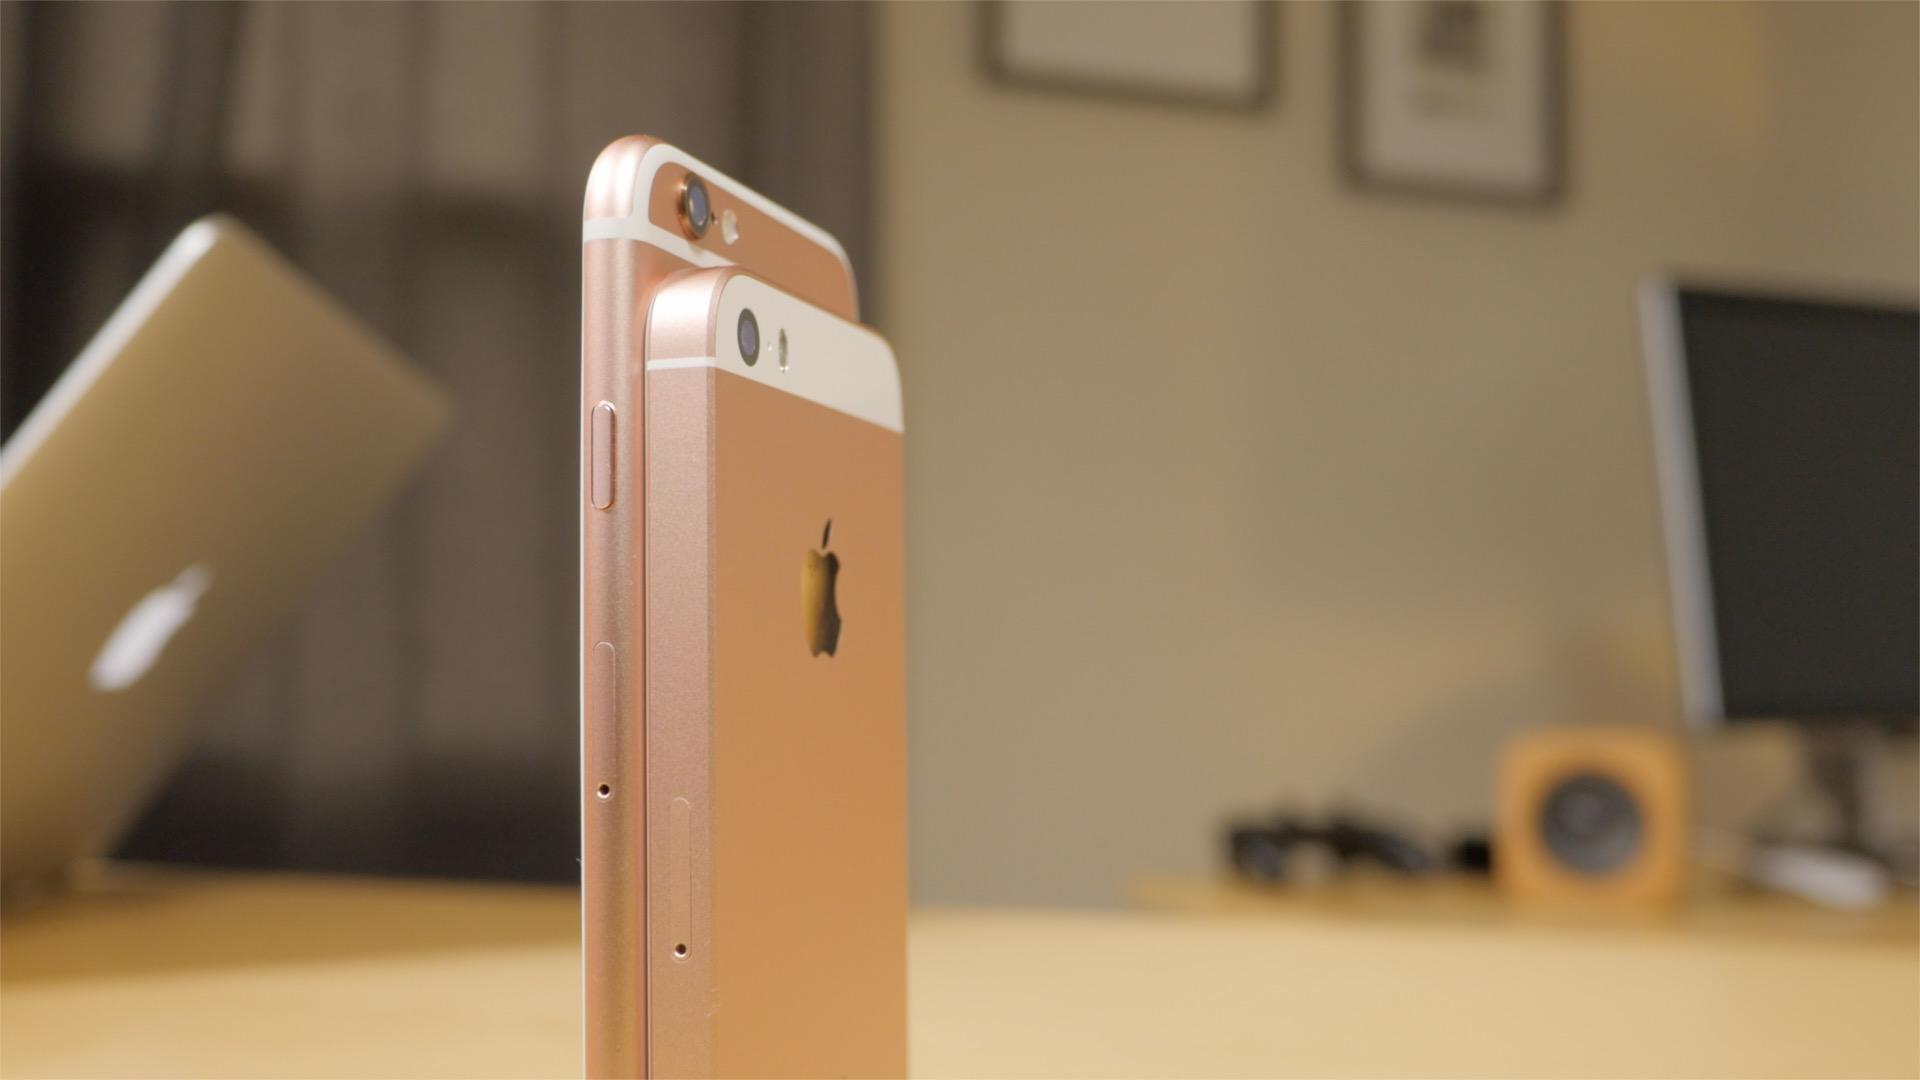 apple-iphone-se-rose-gold